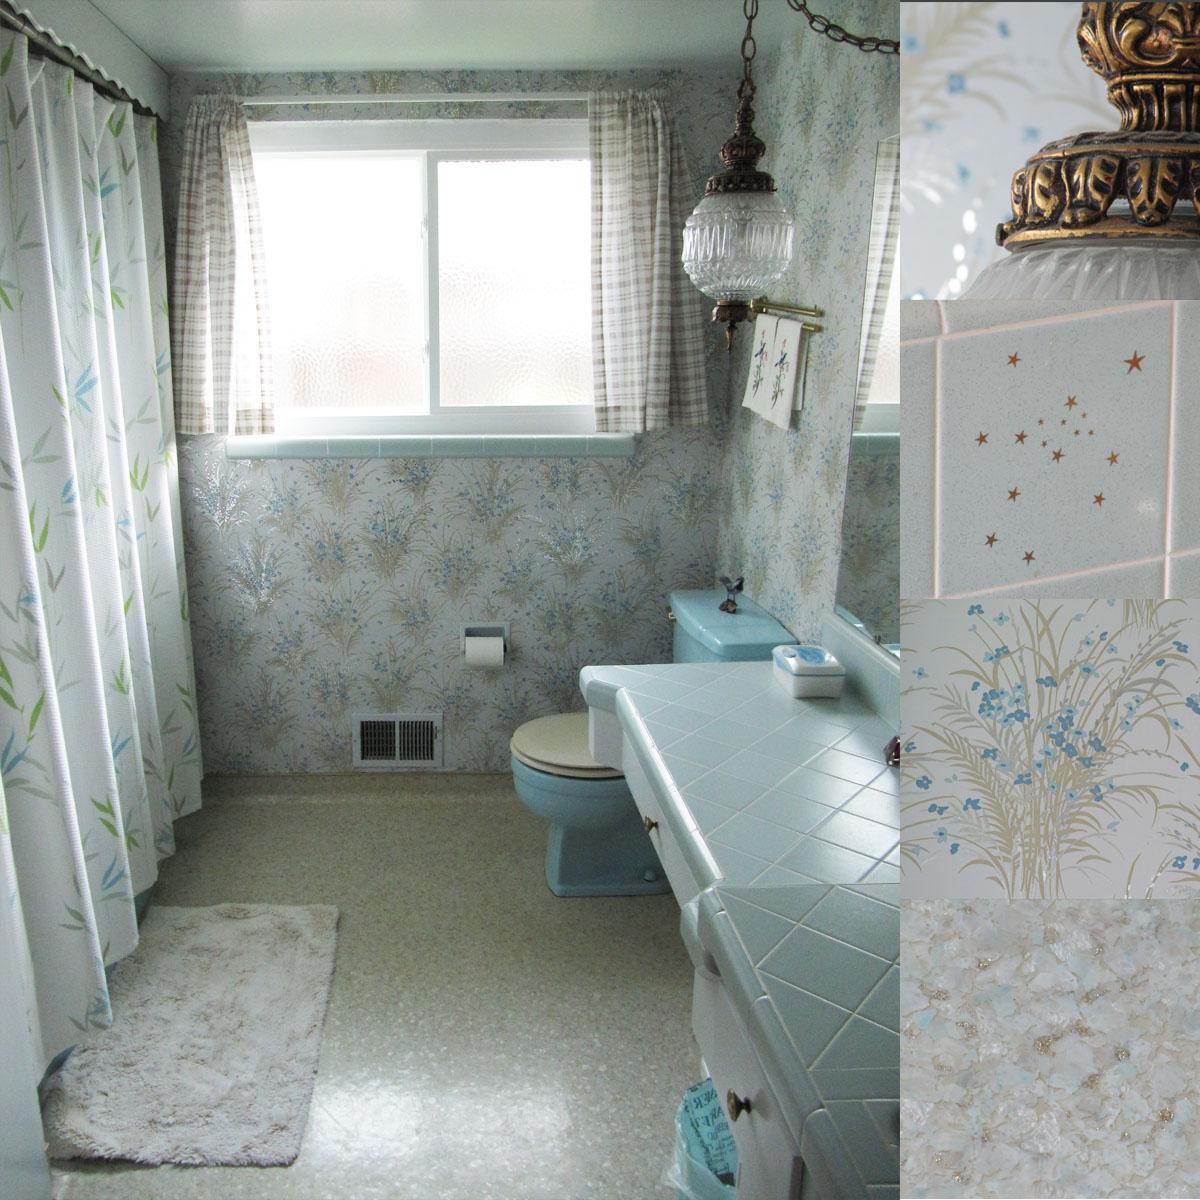 Shirley Shirley Bo Birley Retro Blue Bathroom